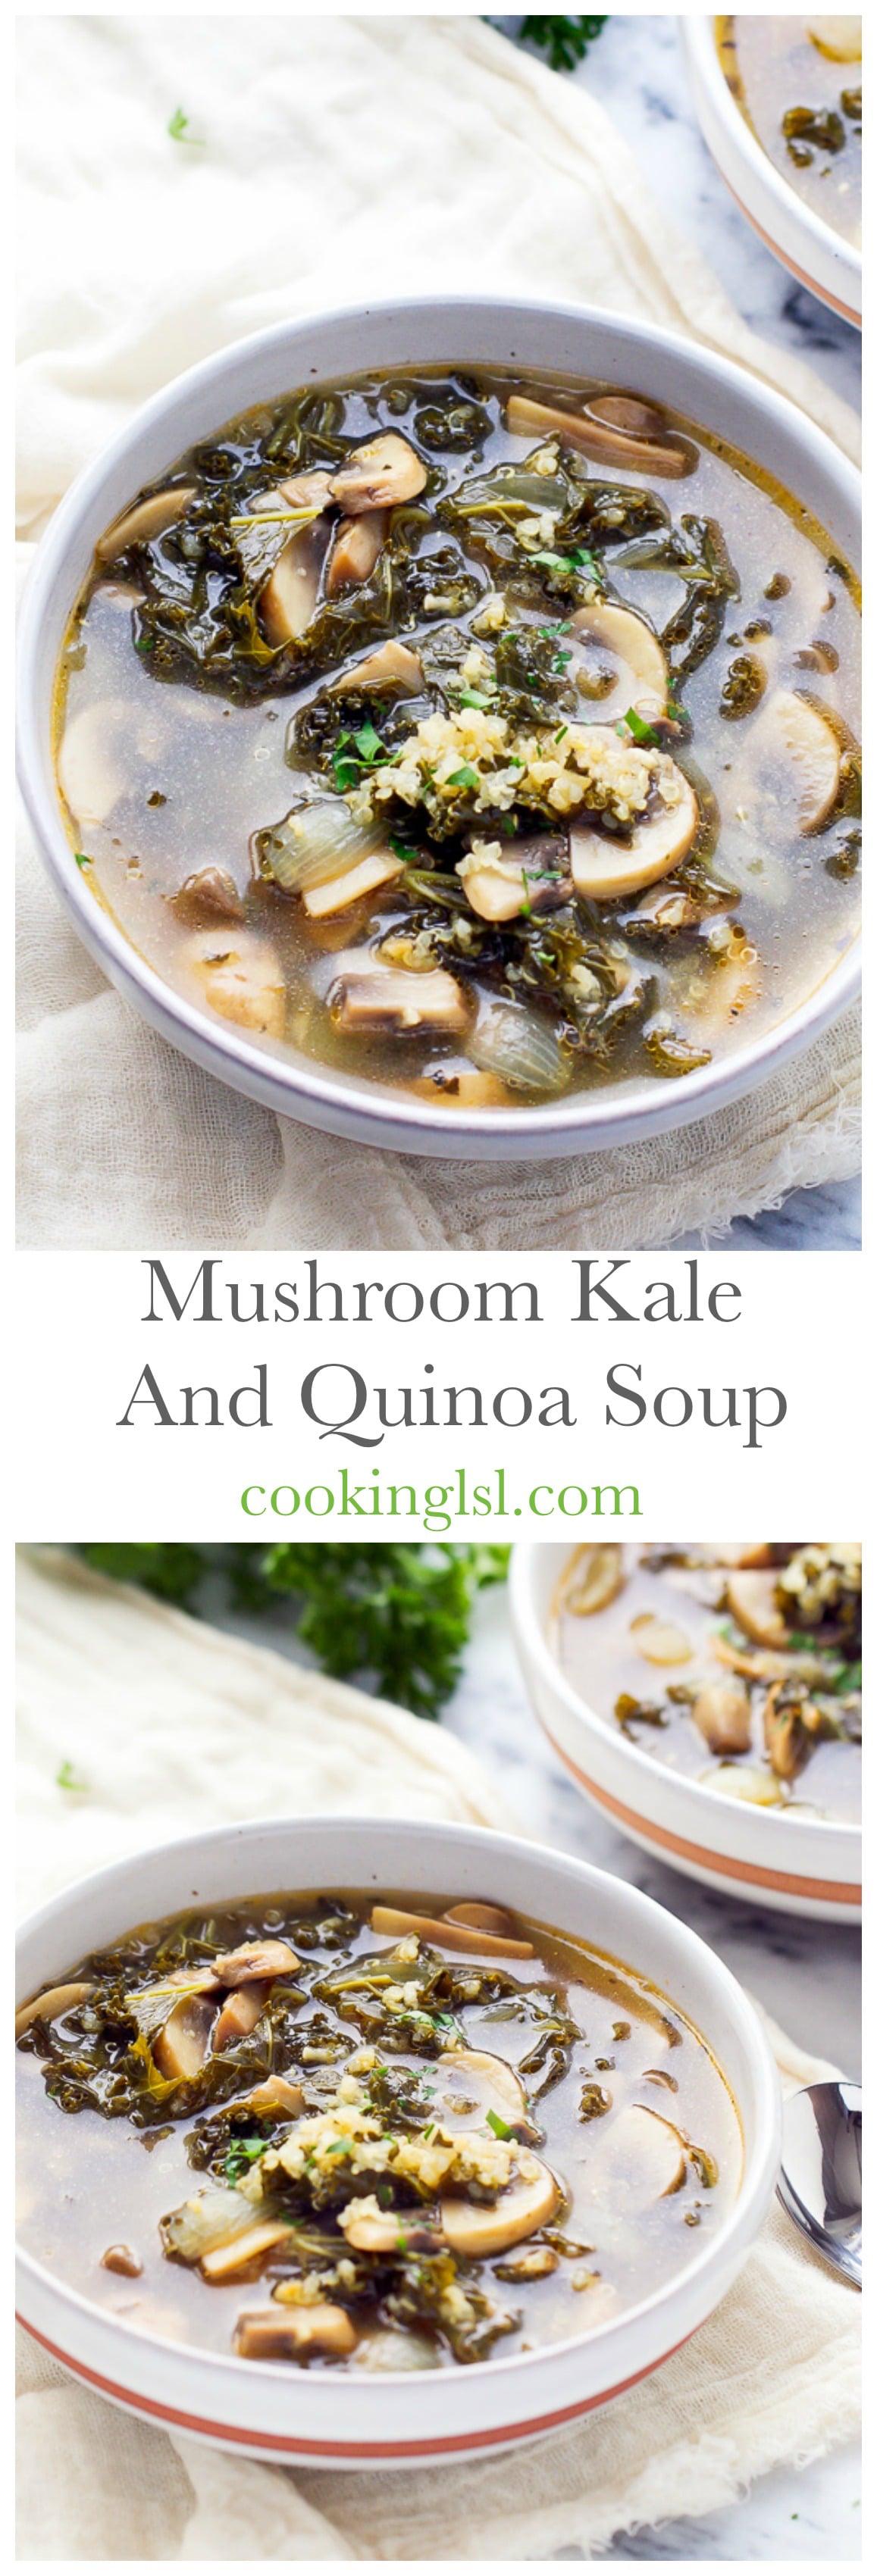 kale-quinoa-mushroom-soup